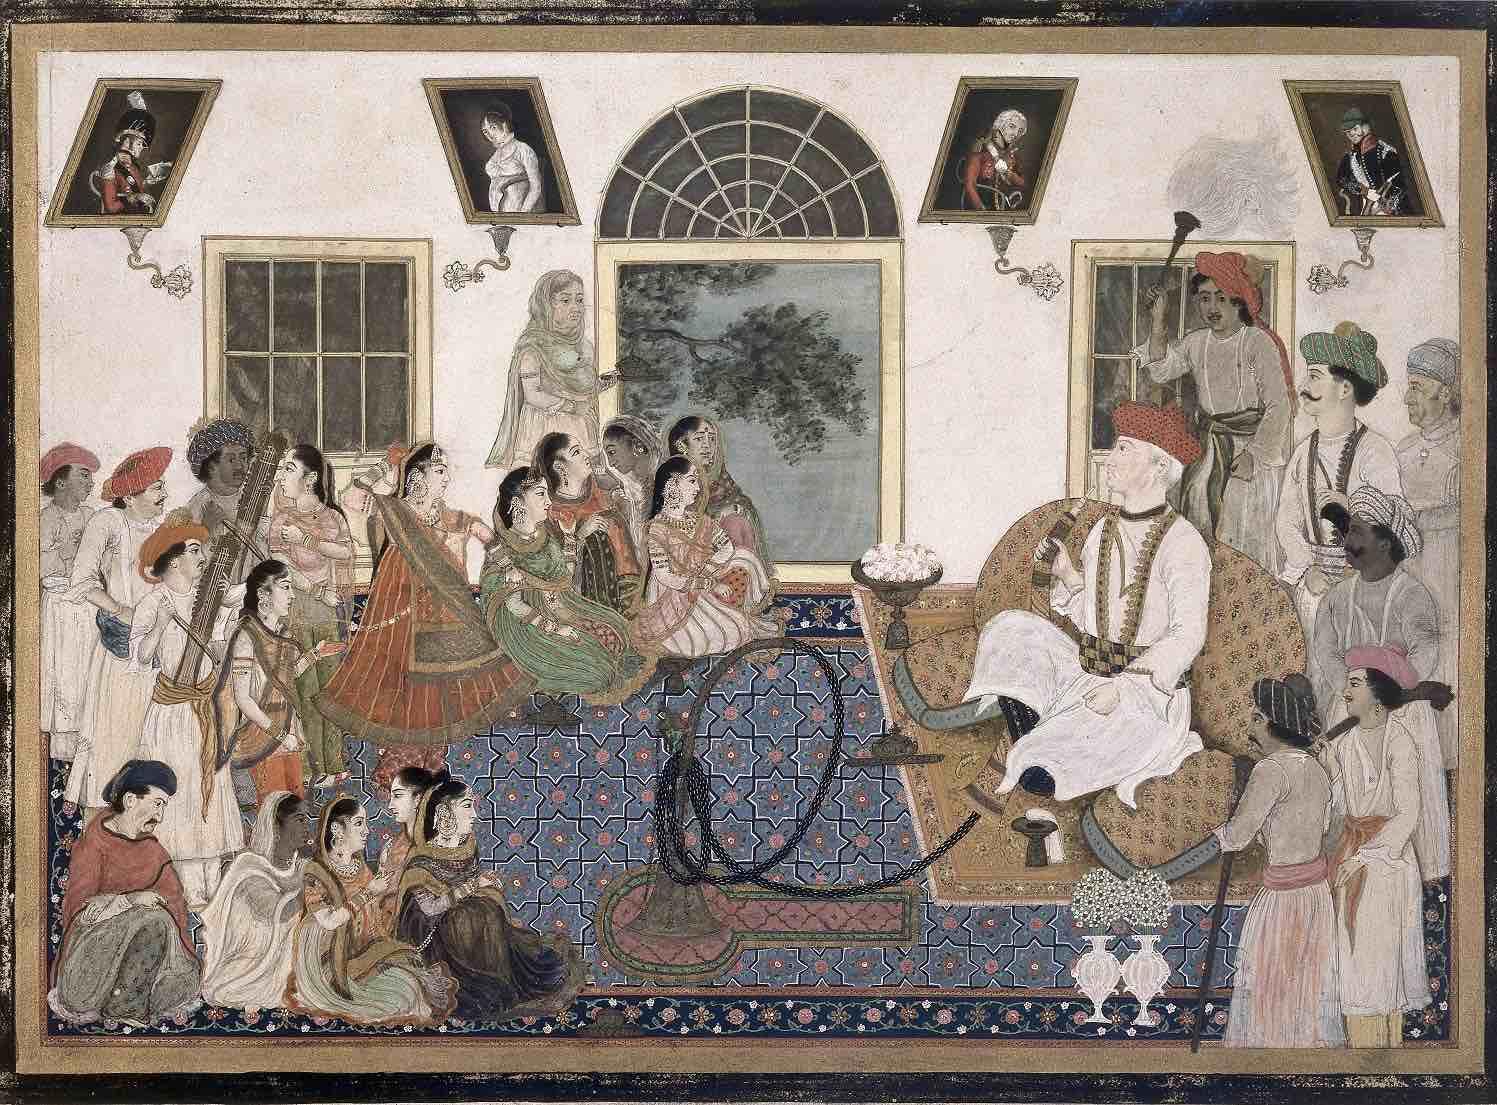 Sir David Ochterlony, the British Resident at the Mughal court c. 1815.